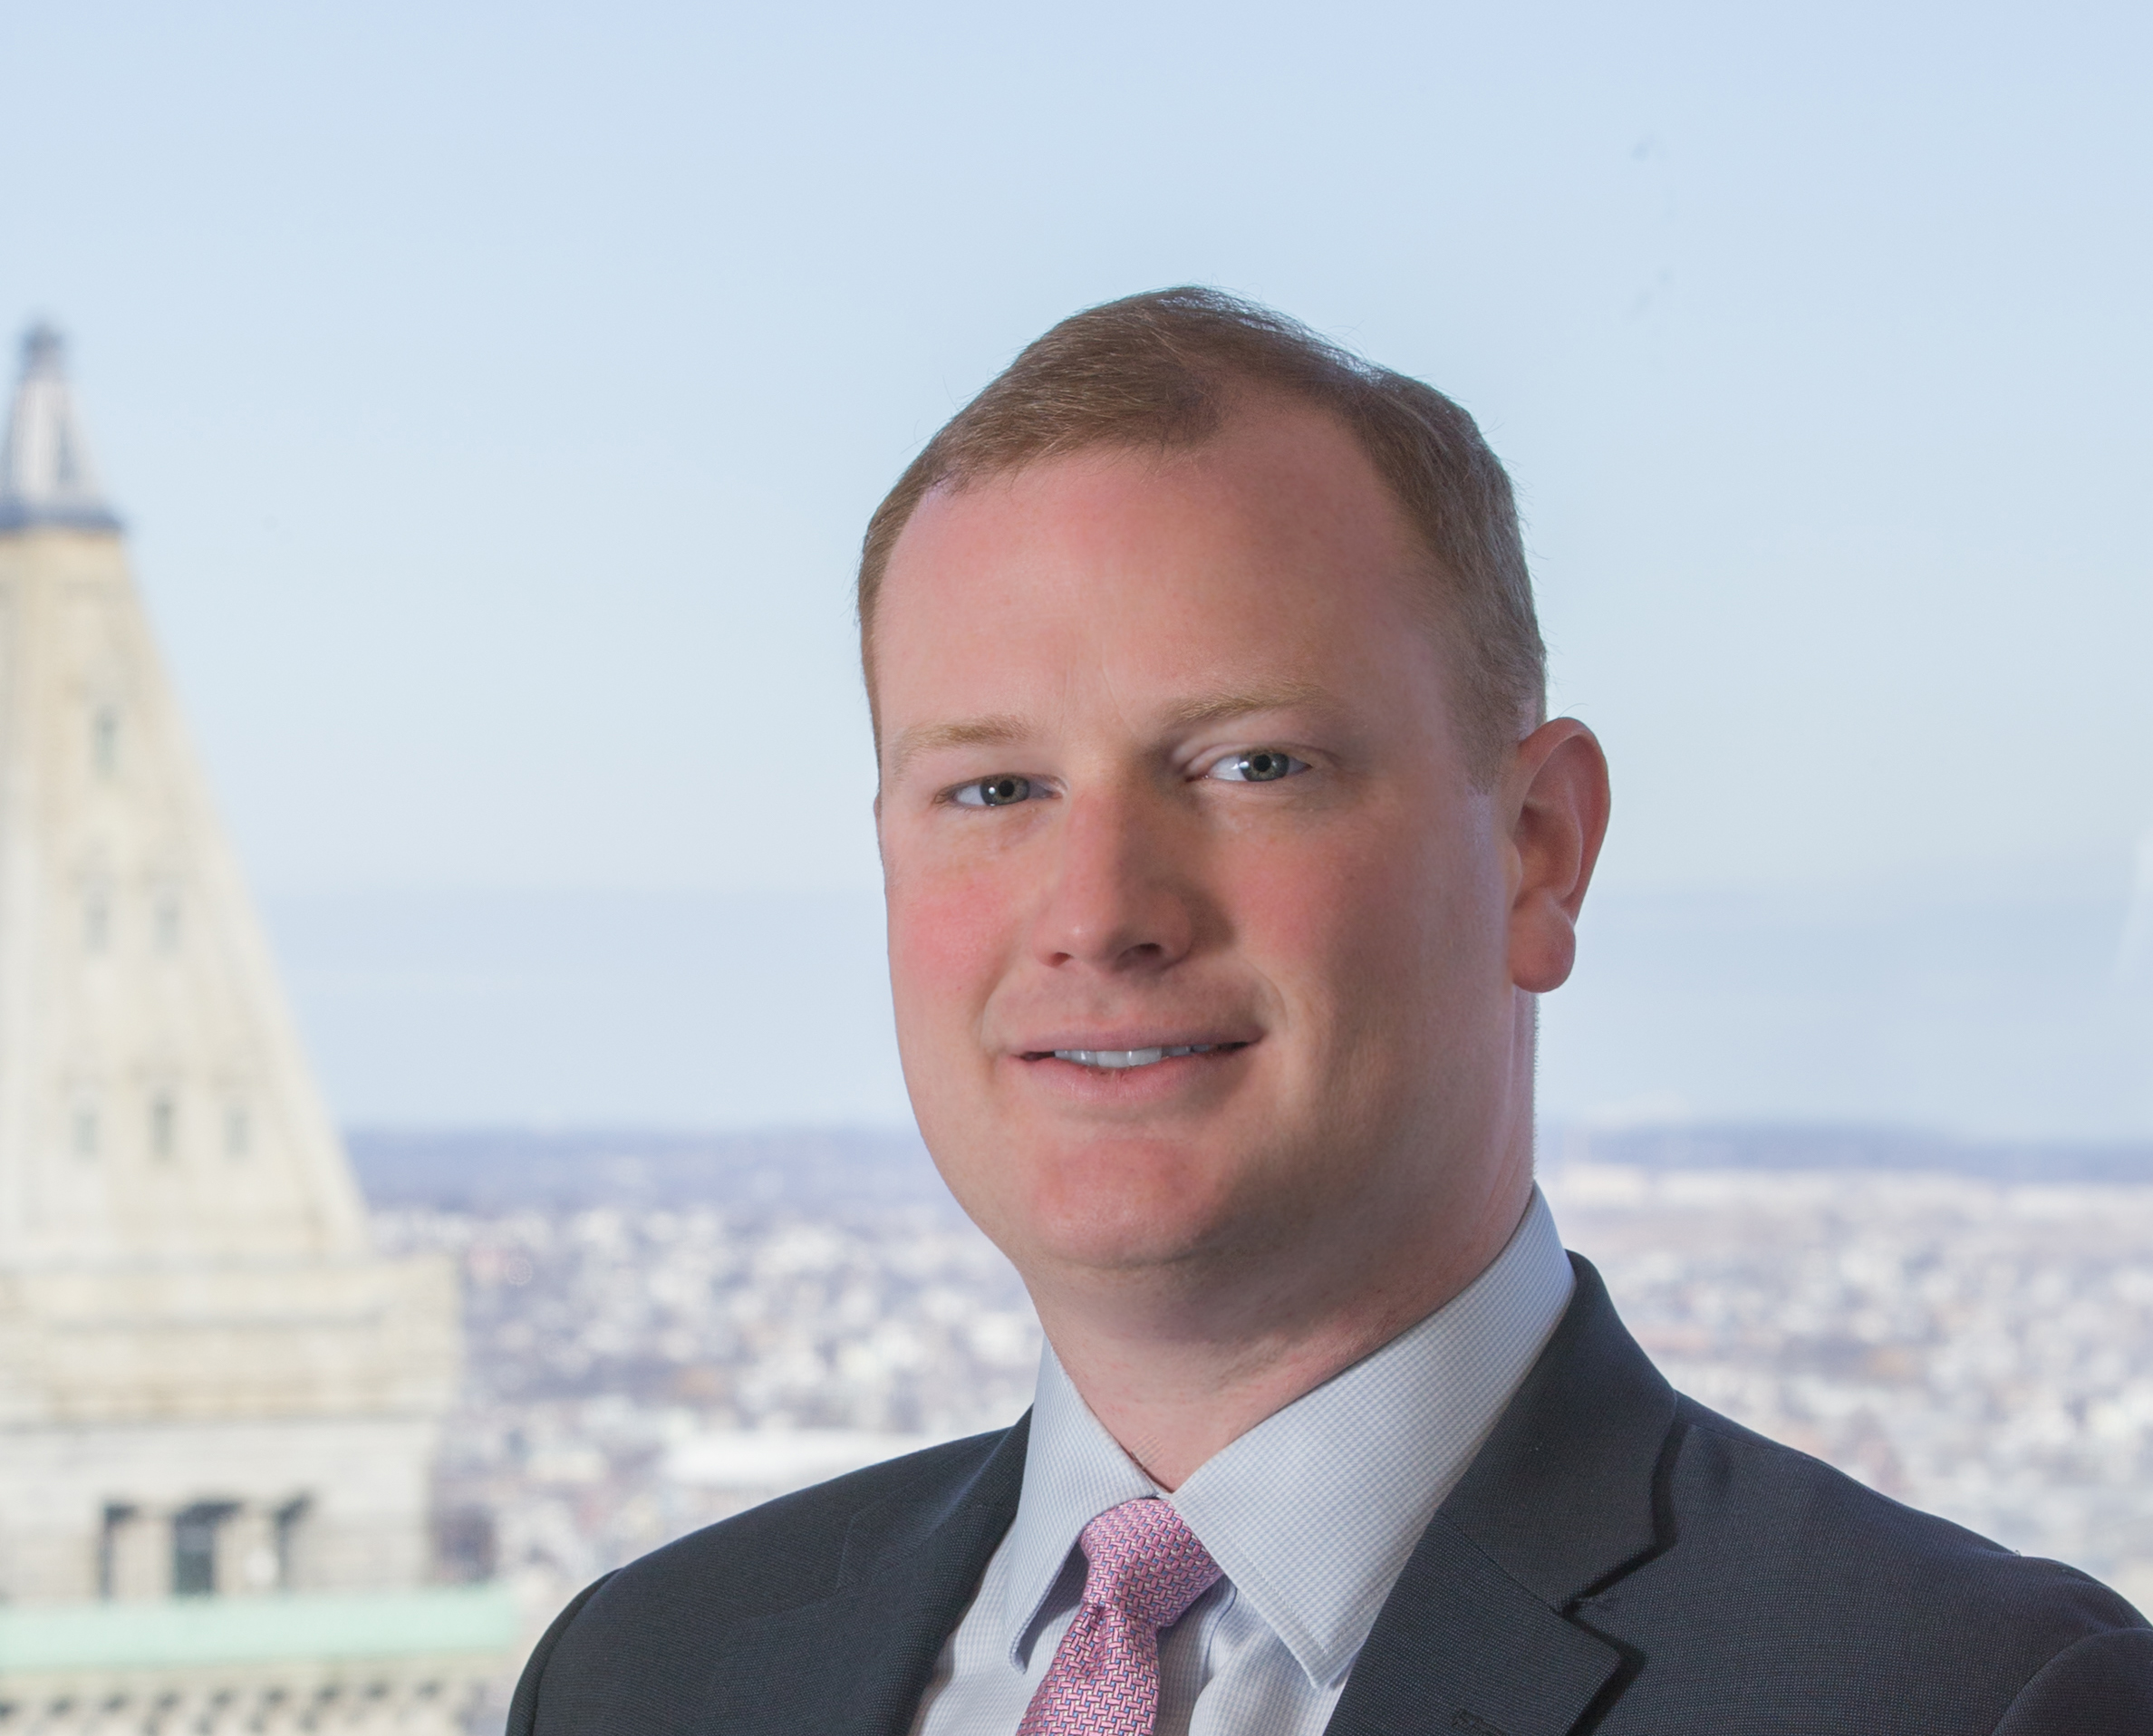 Why I Love My Job: Jerry Murphy at The Davis Companies